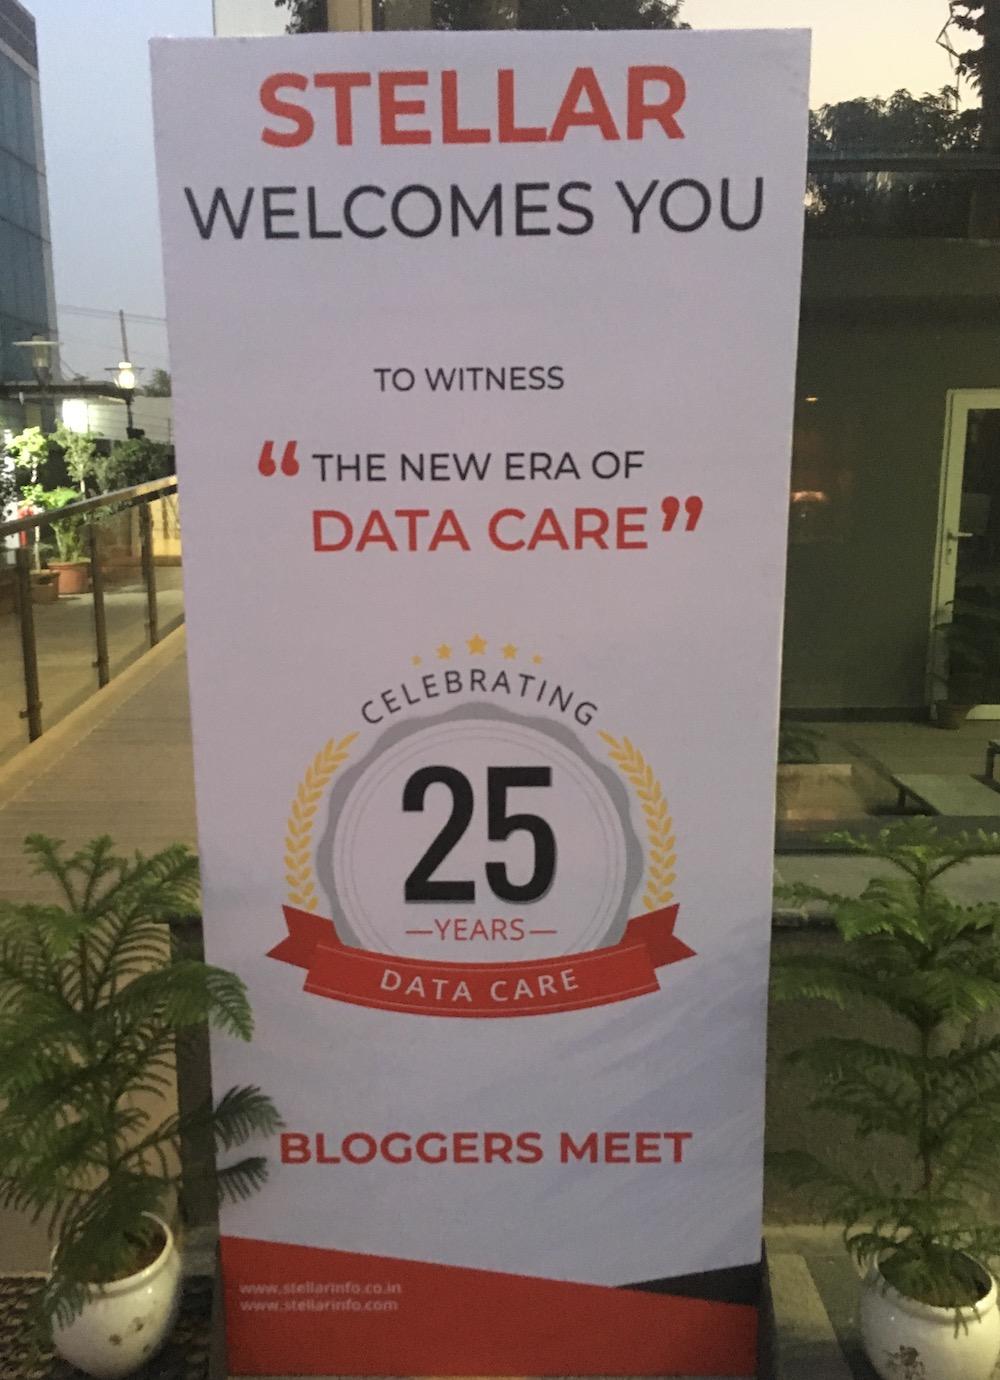 Stellar Bloggers Meet on the DIY Data Care tools. #stellar #askstellar #dataloss #datacare #data #dataretrieval #datarecovery #datamigration #dataerasure #bitraser